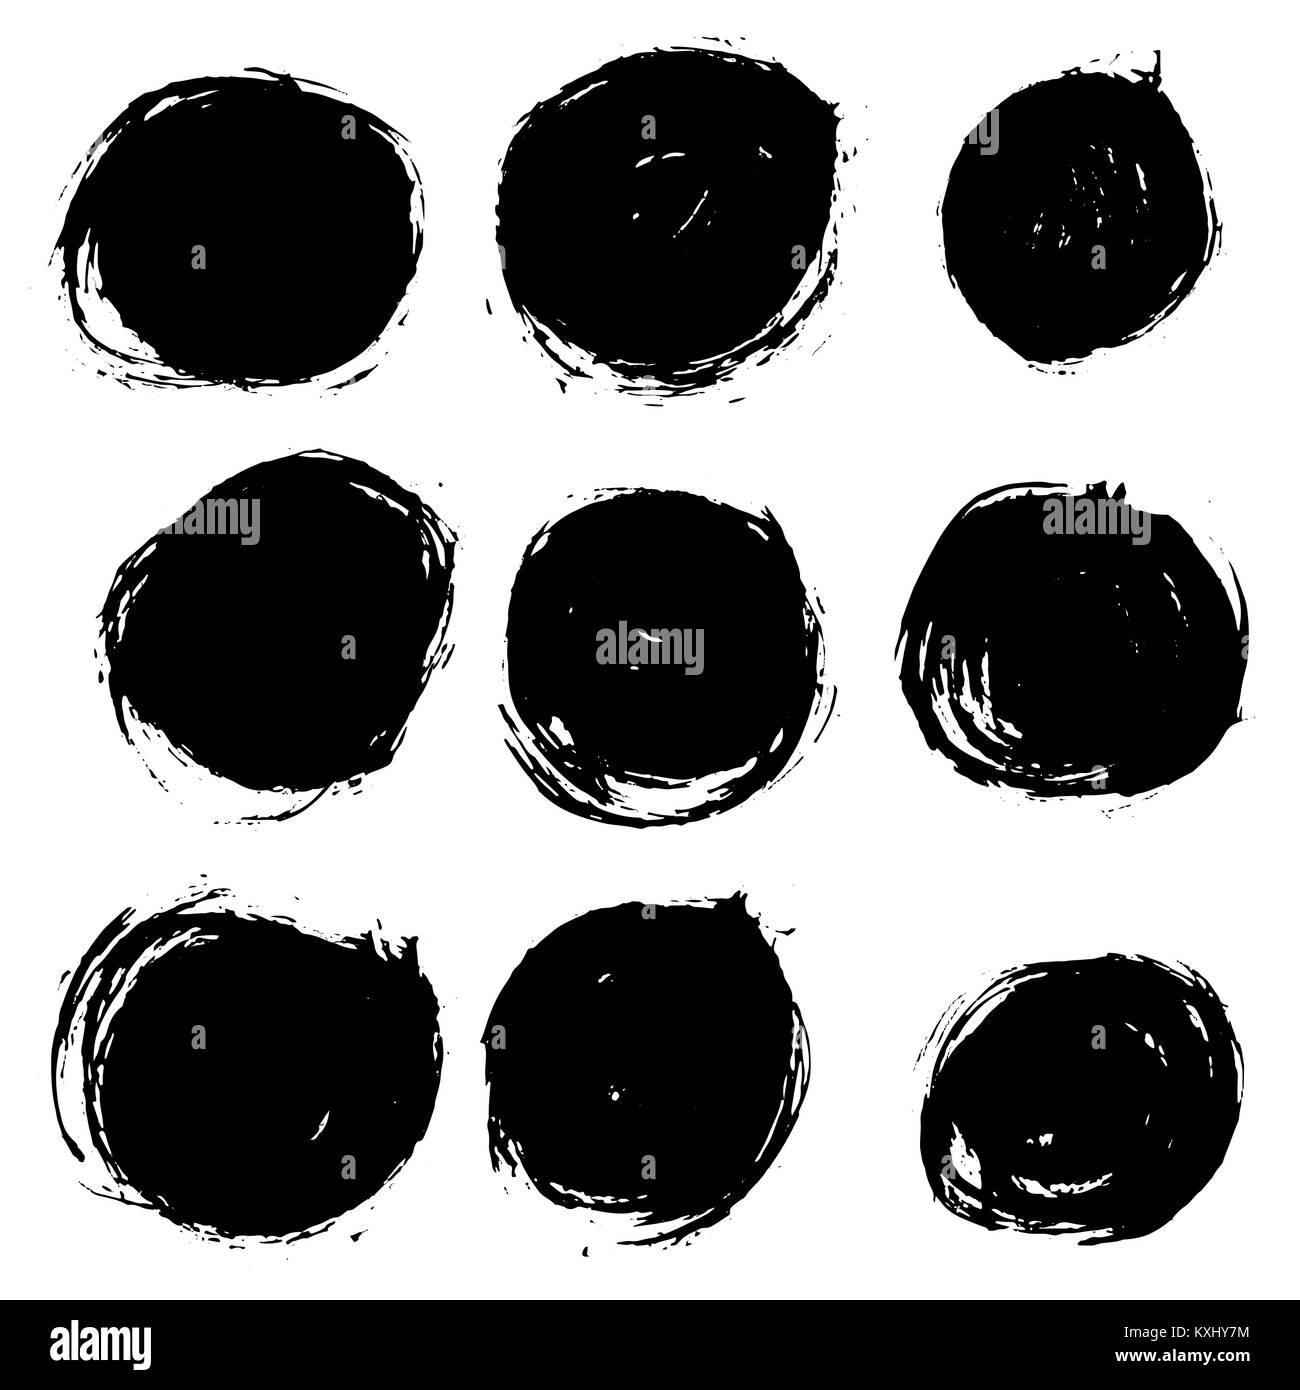 grunge ink round brush strokes freehand black brushes handdrawn